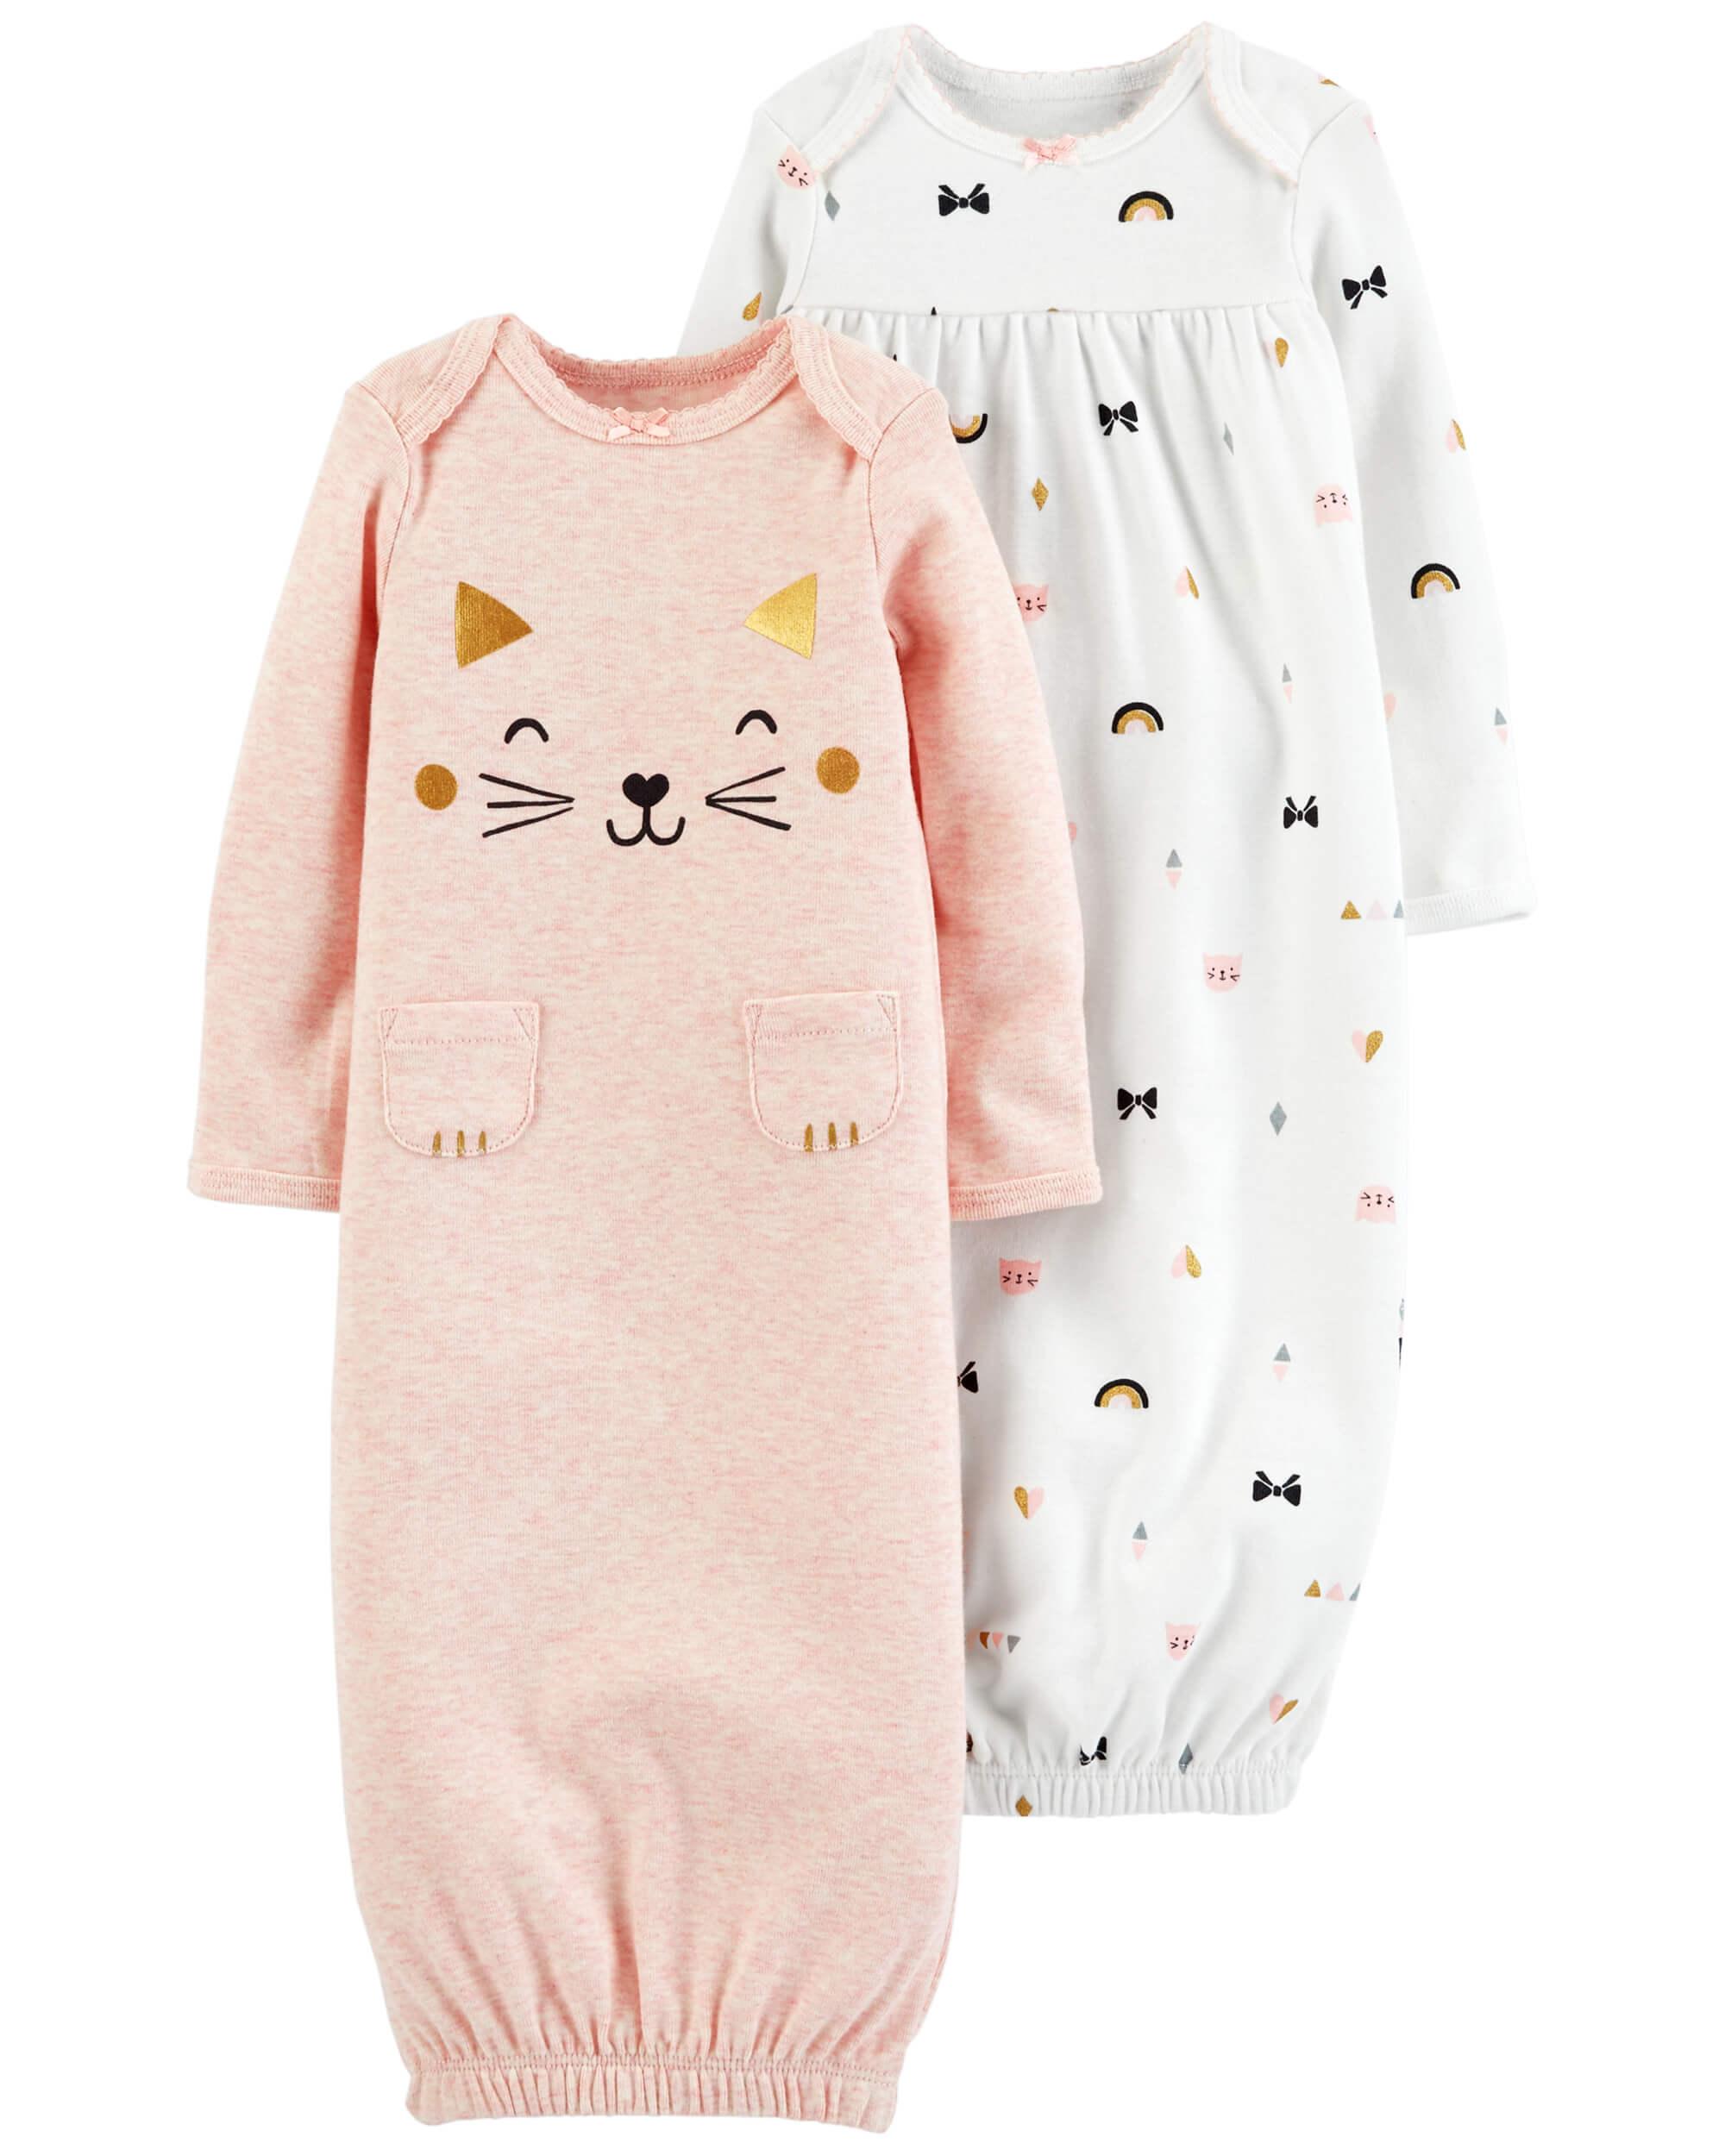 94c4069769a Carter's Φόρμες ύπνου σετ των δύο τεμαχίων ,ροζ -λευκό με σχέδιο γατούλα